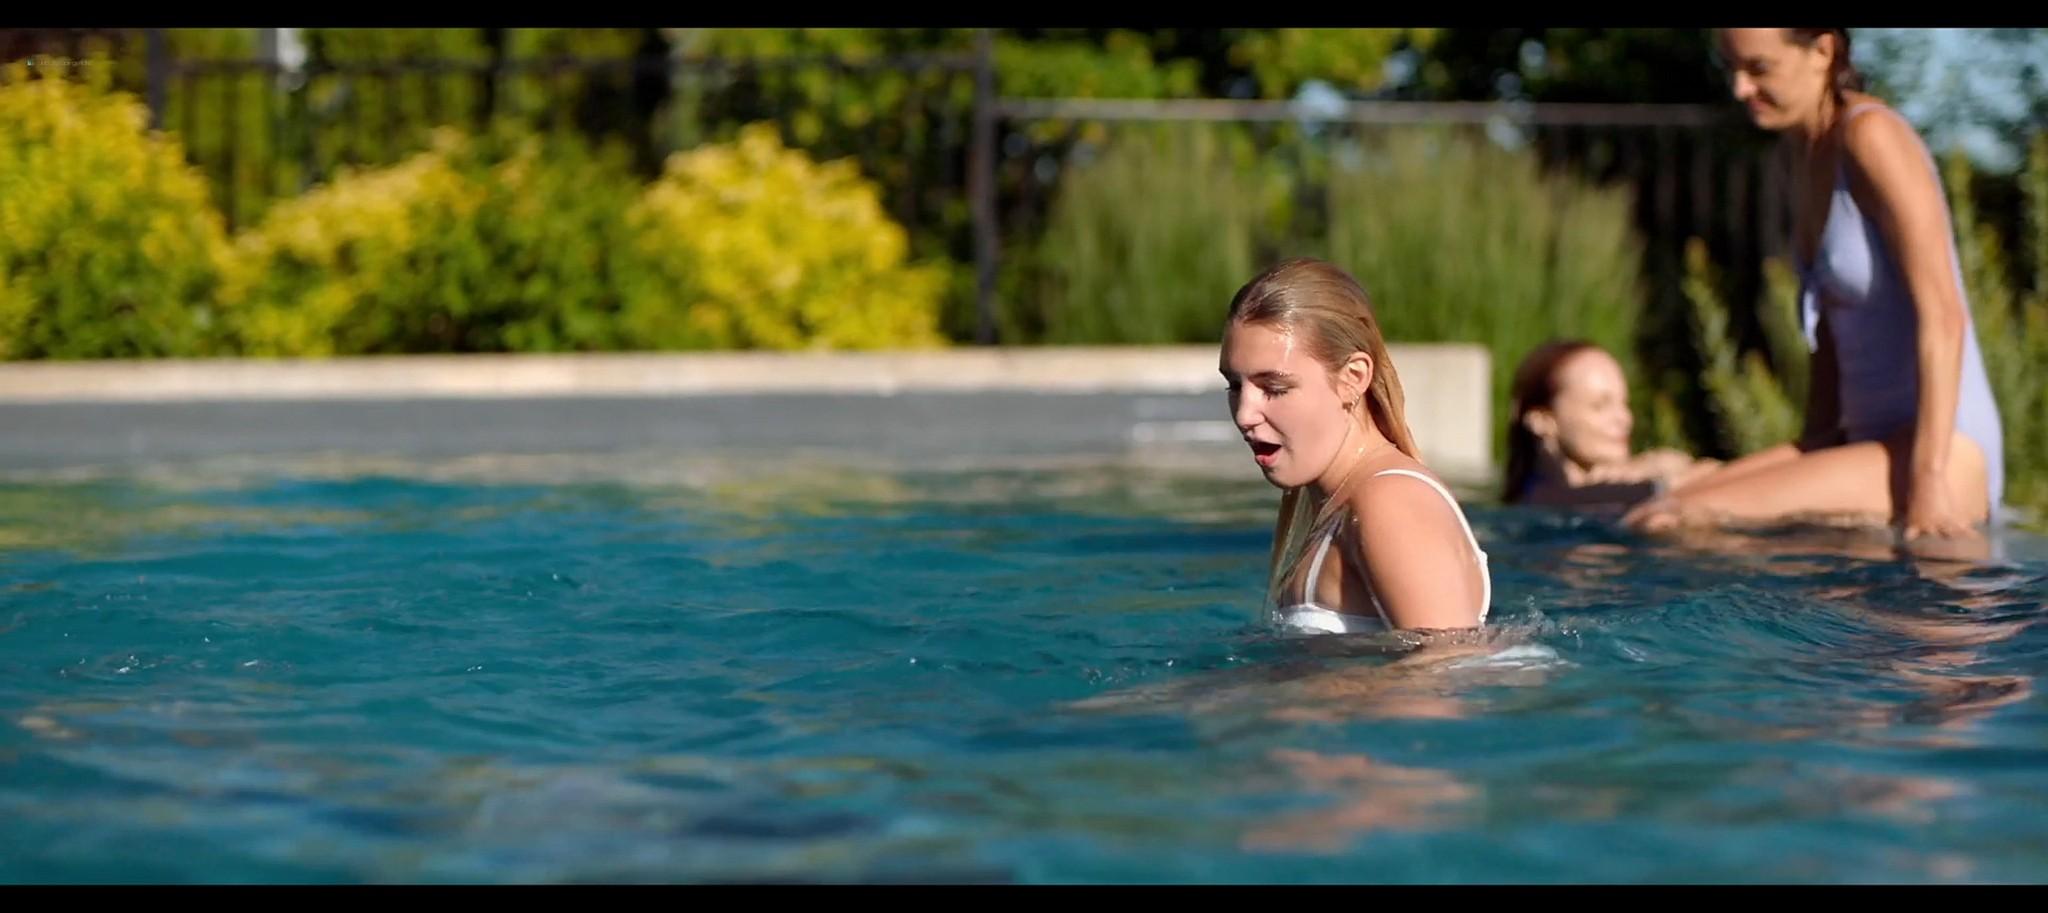 Heather Graham sexy Sophie Nelisse Jodi Balfour hot The Rest of Us 2019 1080p WEB 13